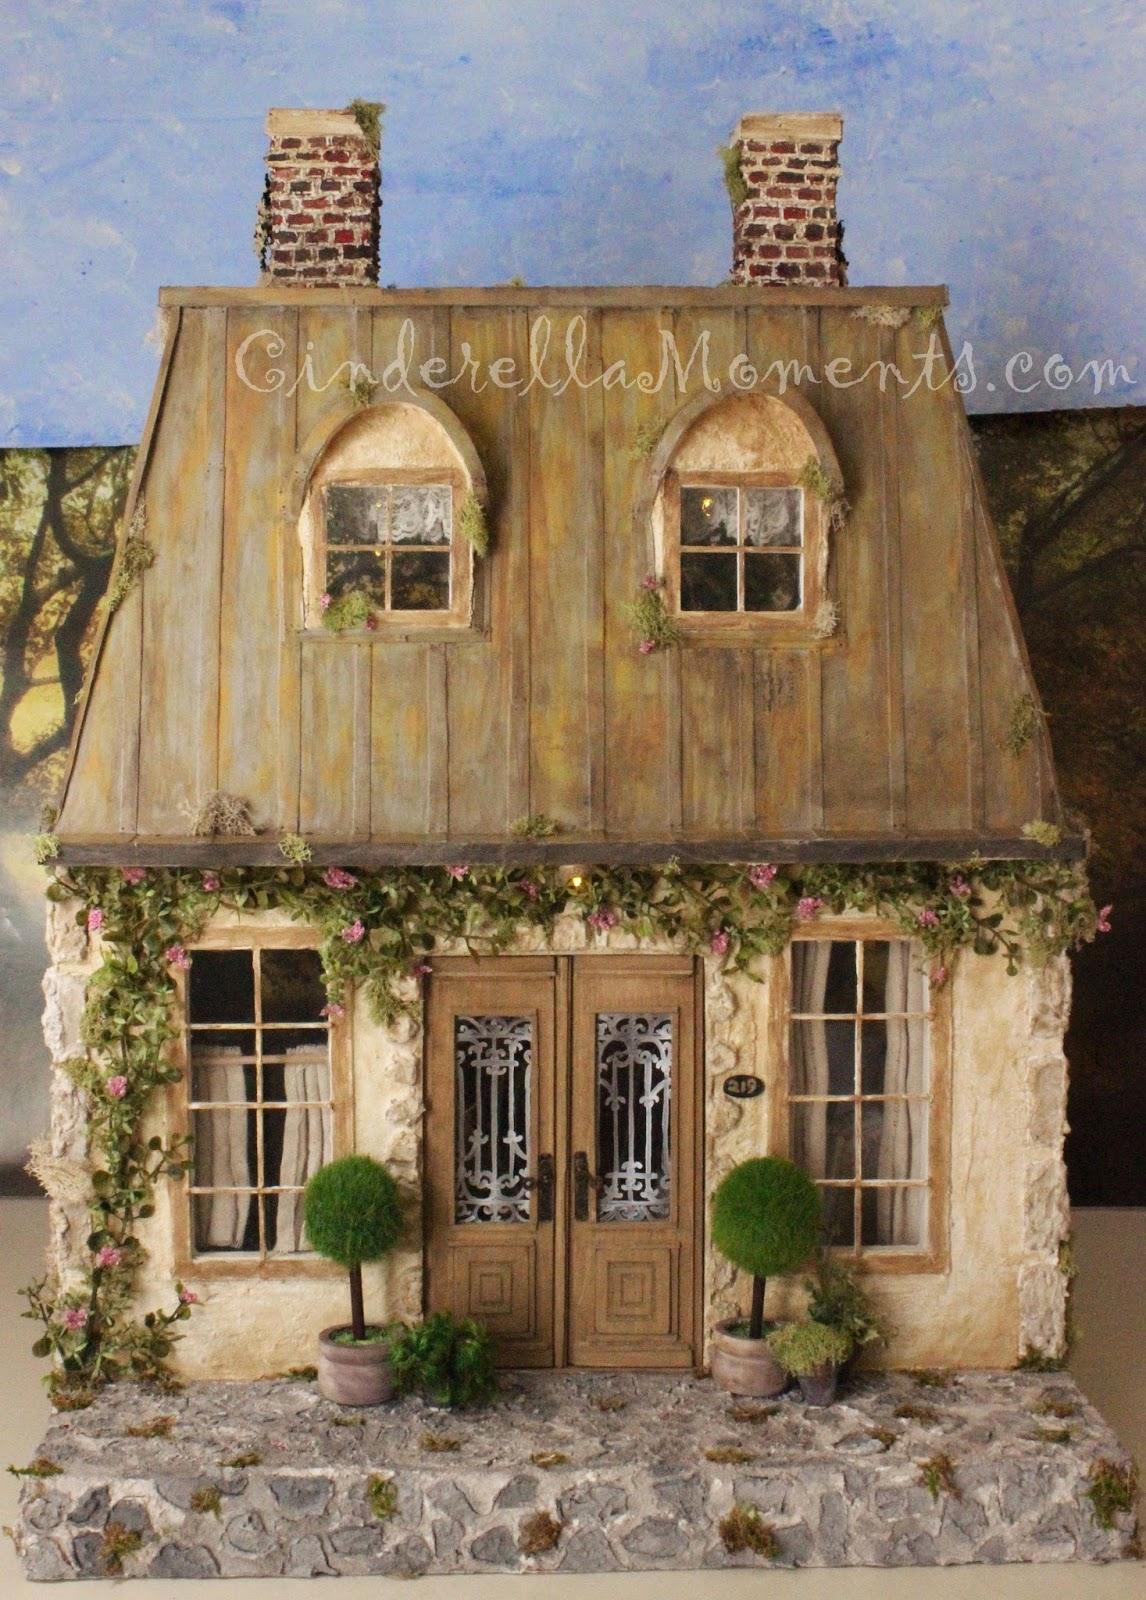 Cinderella moments la maison de campagne custom dollhouse - La maison de campagne ...